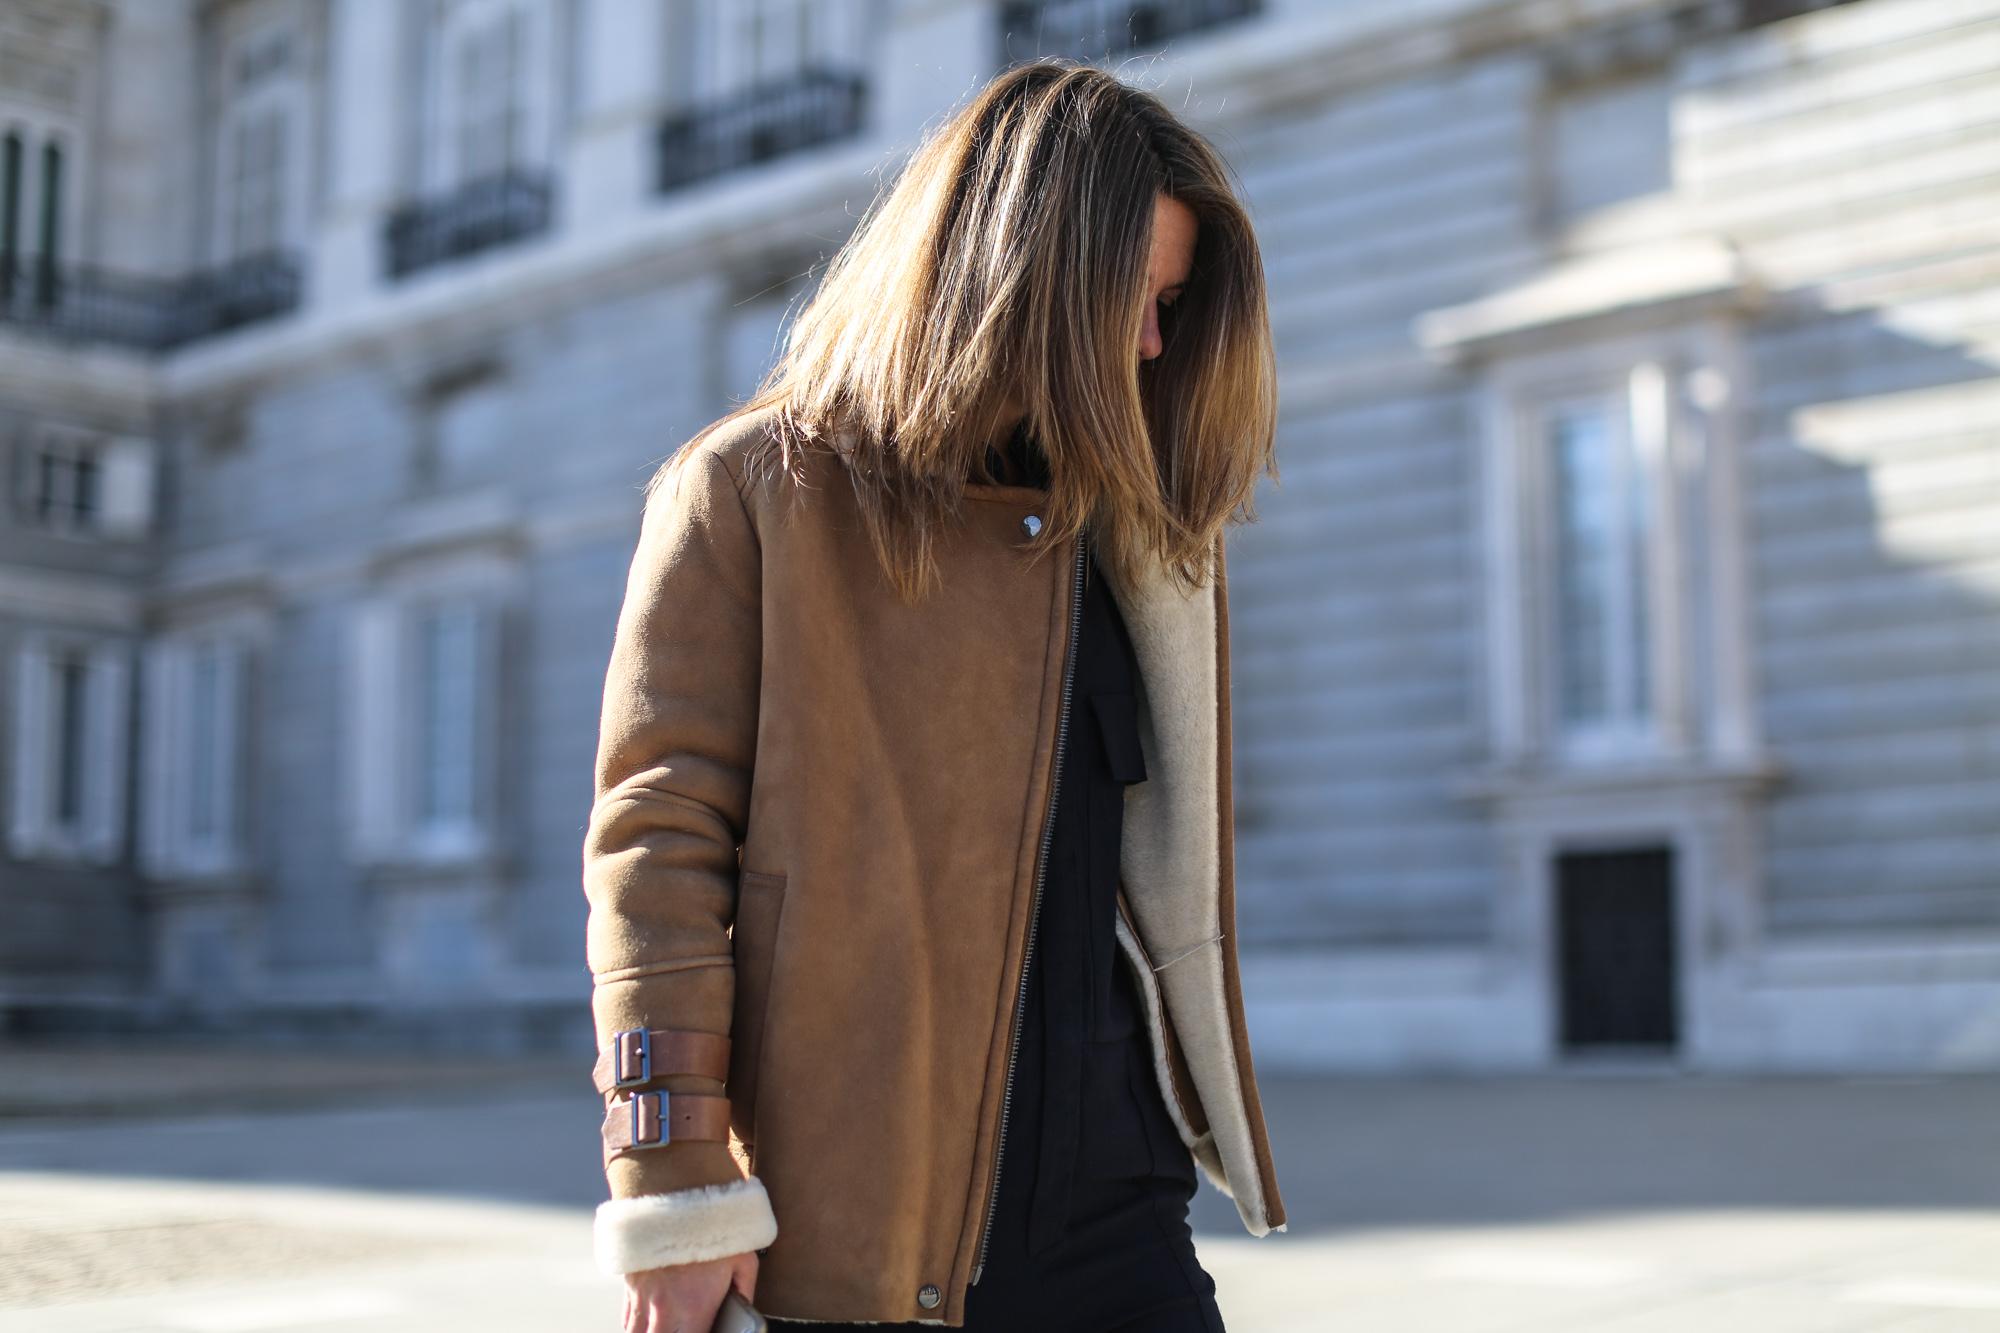 Clochet_streetstyle_mango_suede_leather_aviator_coat_adidas_samba_leztinstreet-18